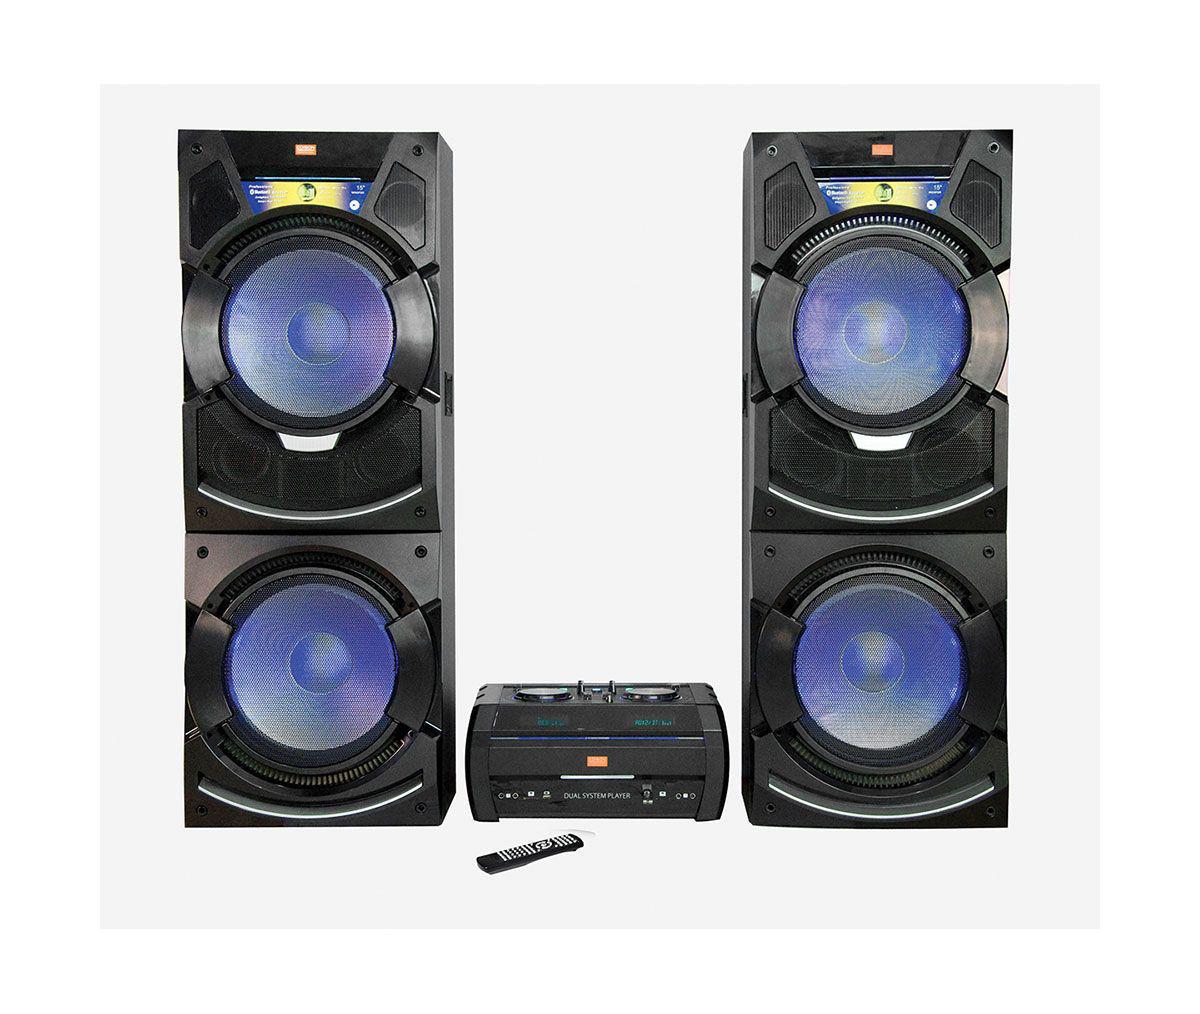 Edison Professional Bluetooth Stereo Sysytem Badcock Home Furniture More